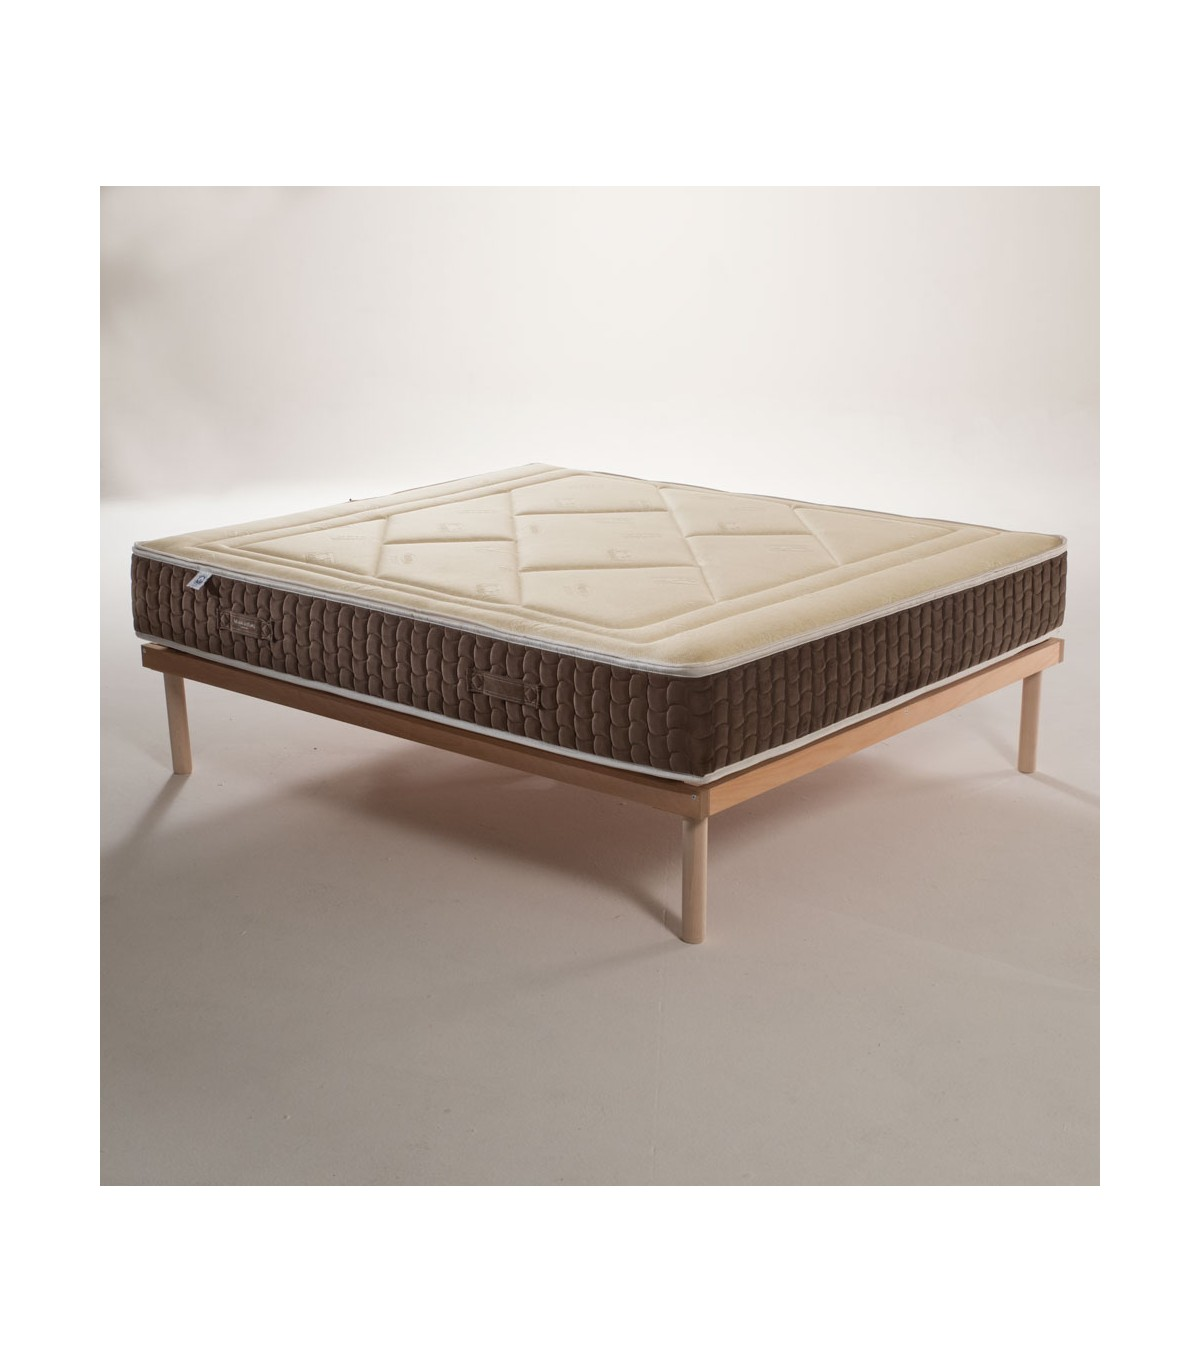 Body Relax Materassi Prezzi.Mattress In Soia Memory With Different Comfort Zones H25